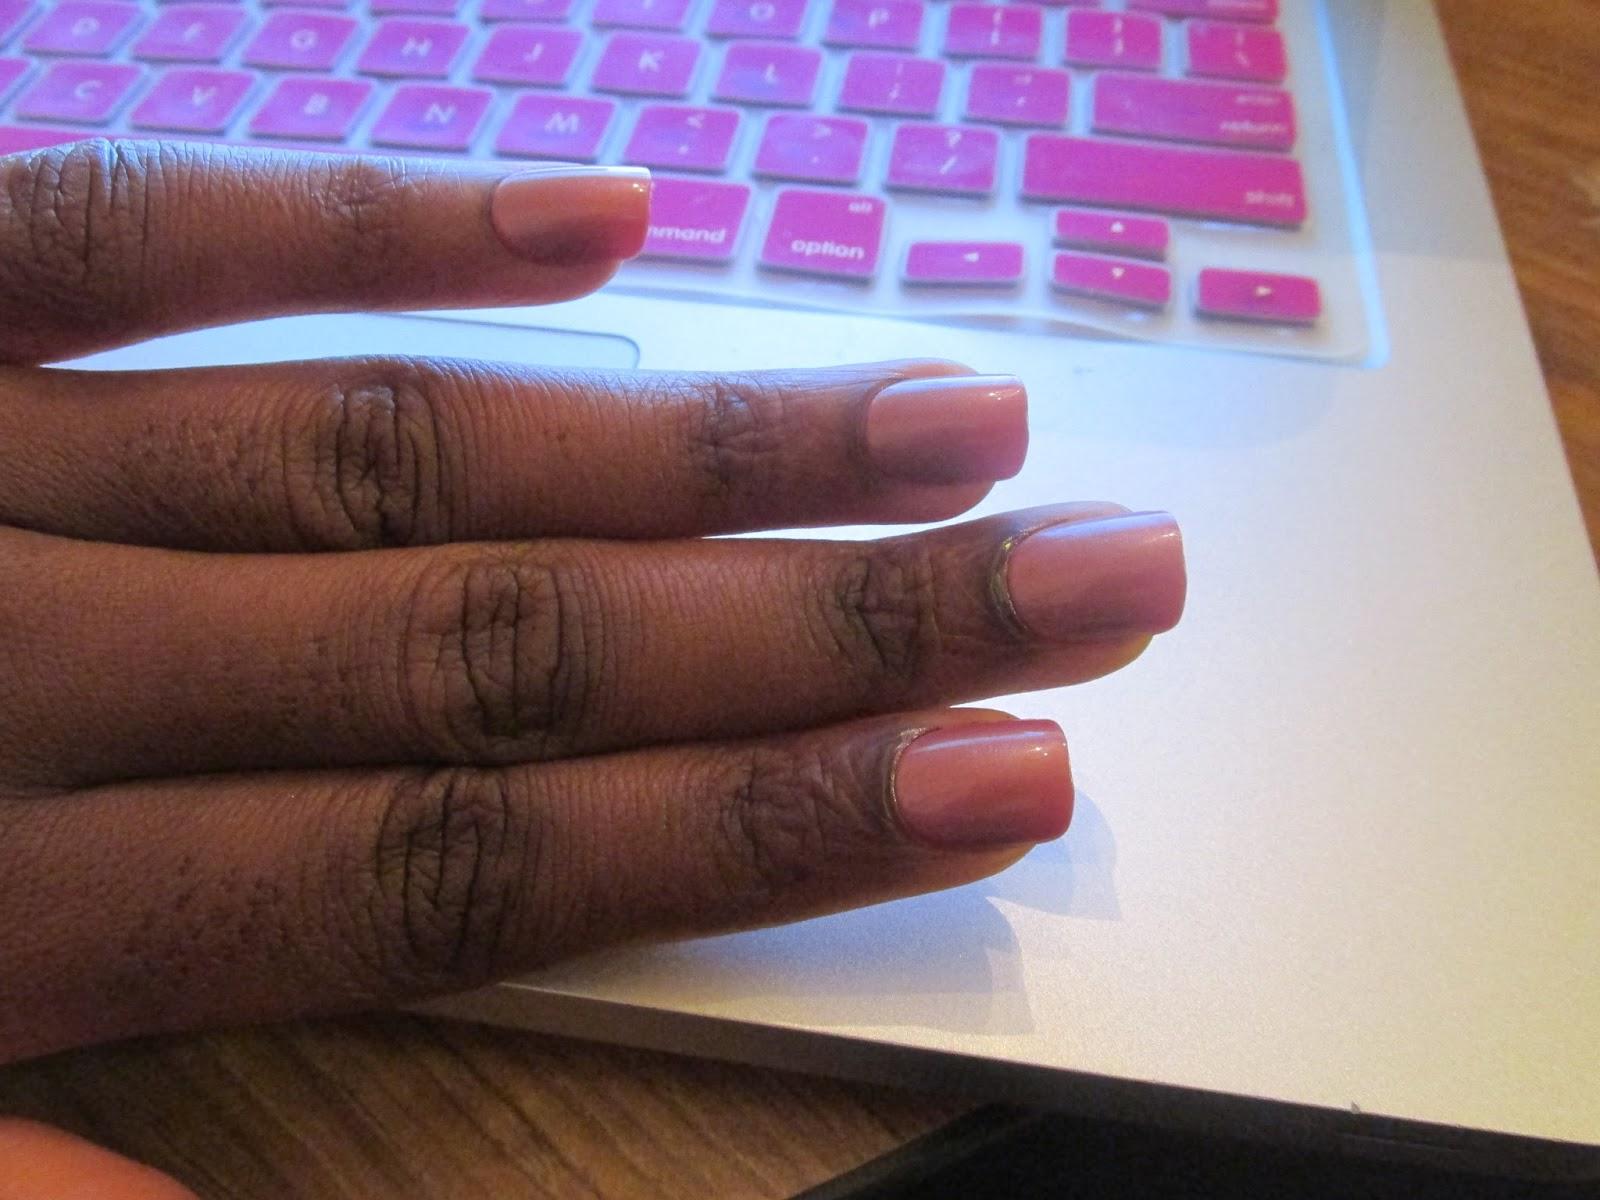 comment mettre des faux ongles sans ab mer ses ongles naturels helowaddicted. Black Bedroom Furniture Sets. Home Design Ideas